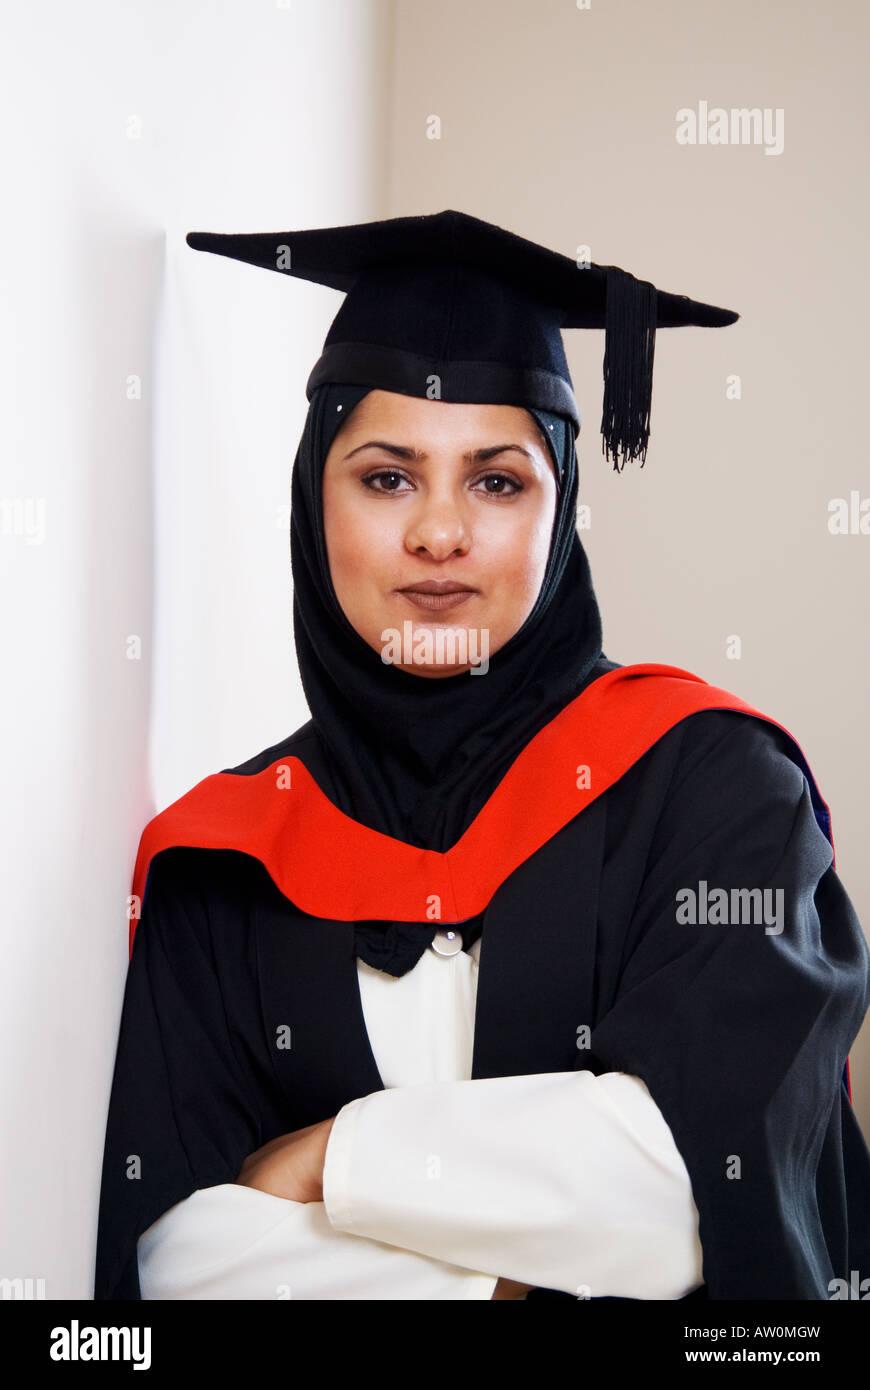 Muslim Graduation Stock Photos & Muslim Graduation Stock Images - Alamy